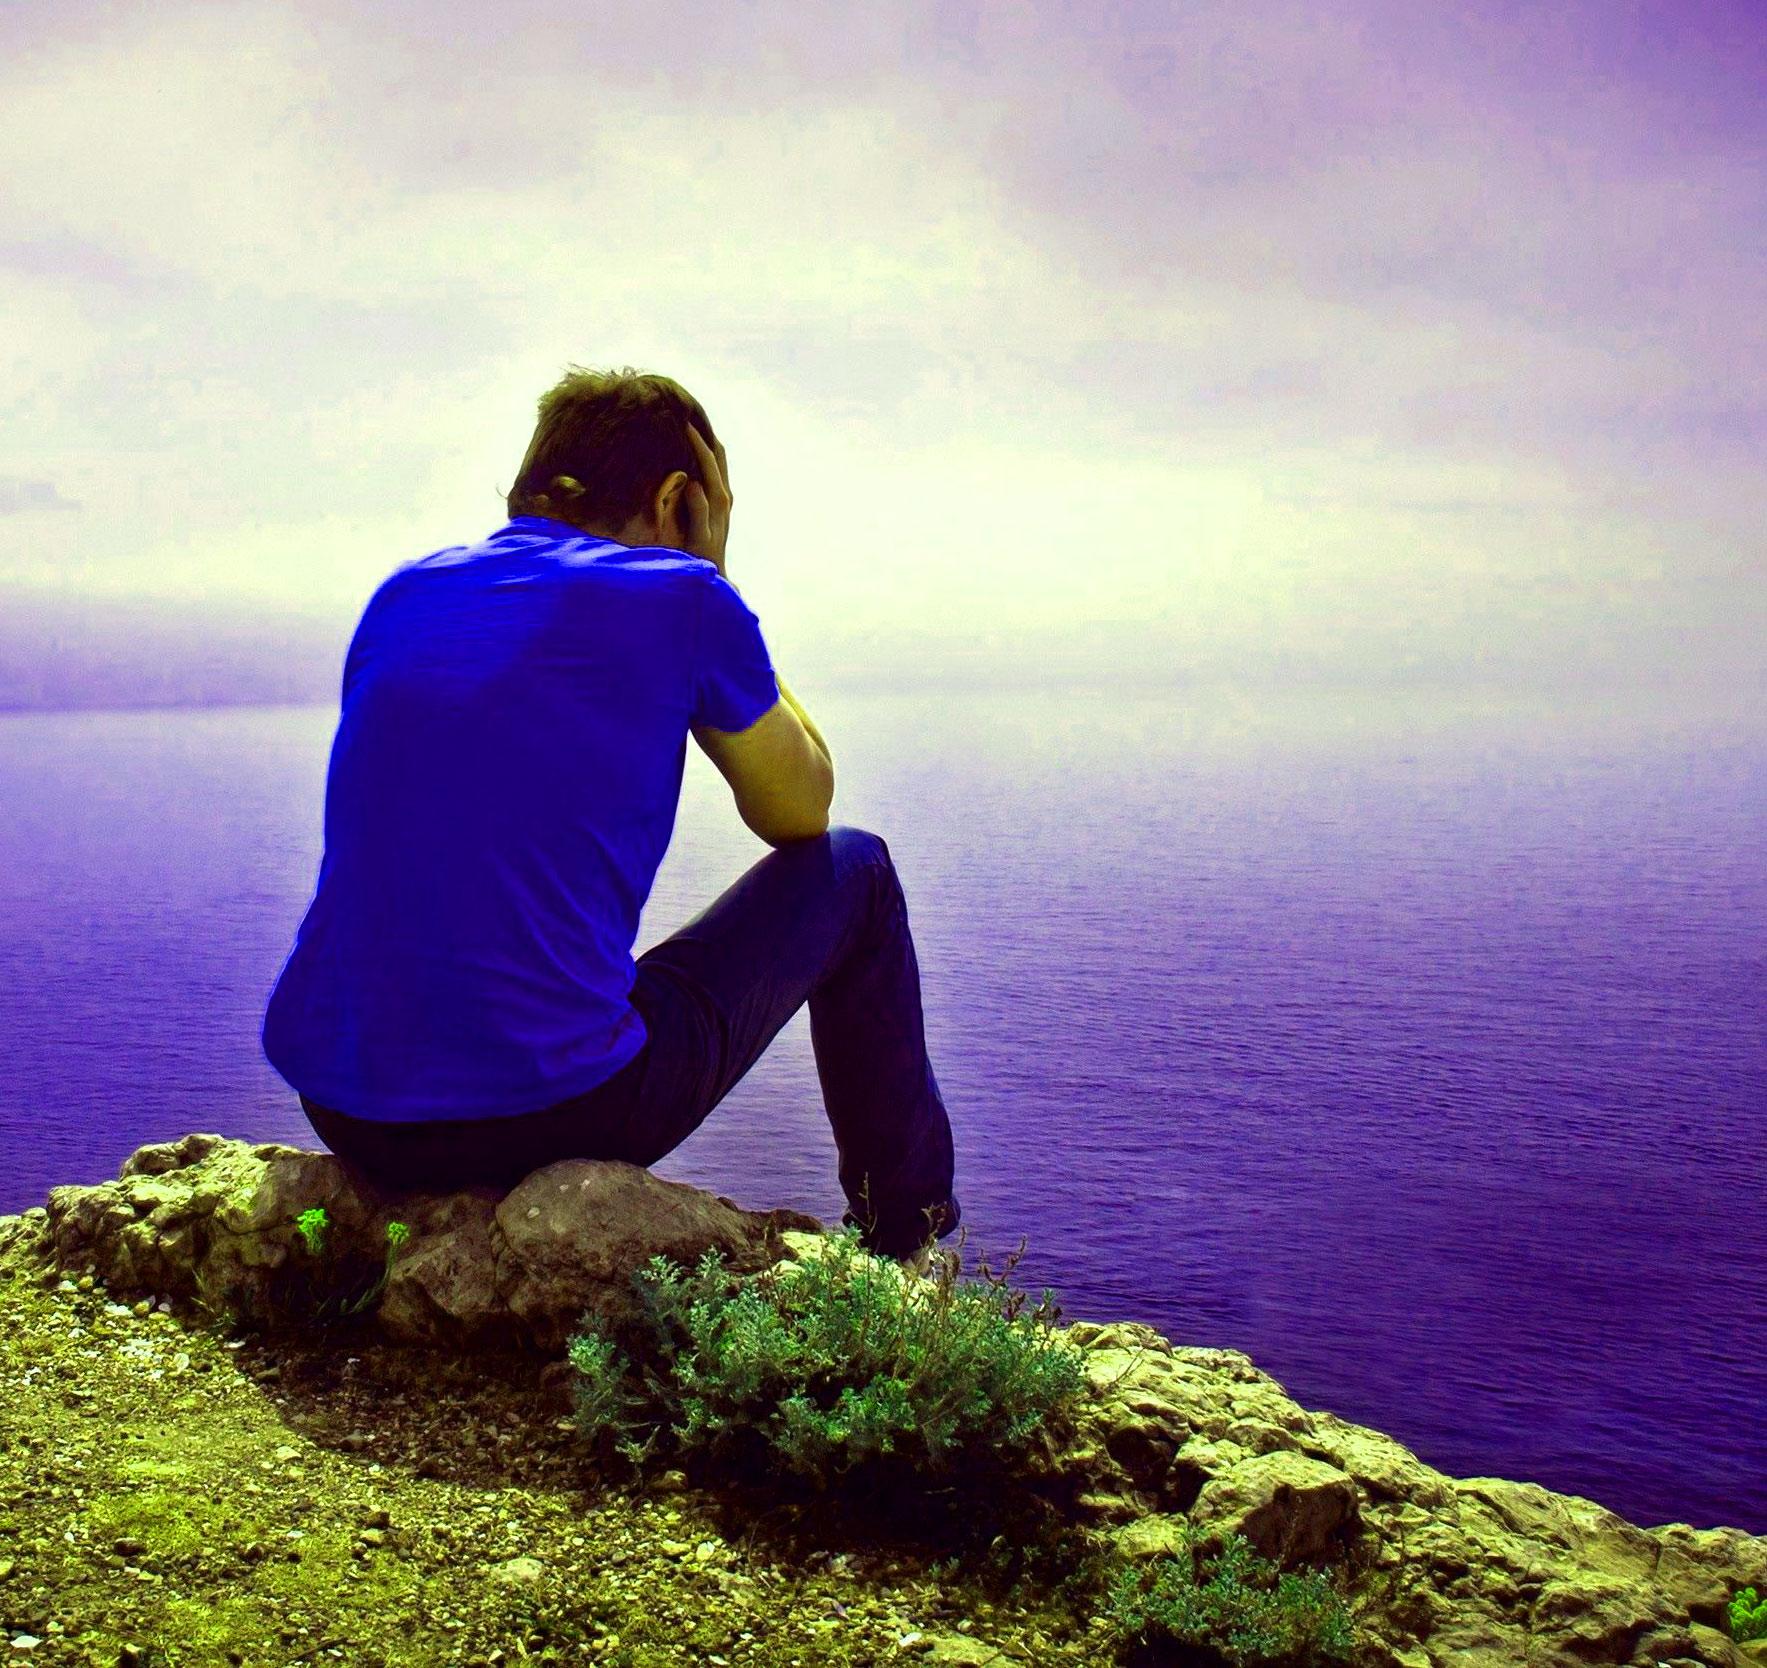 Fresh Sad Alone boy whatsapp dp Images